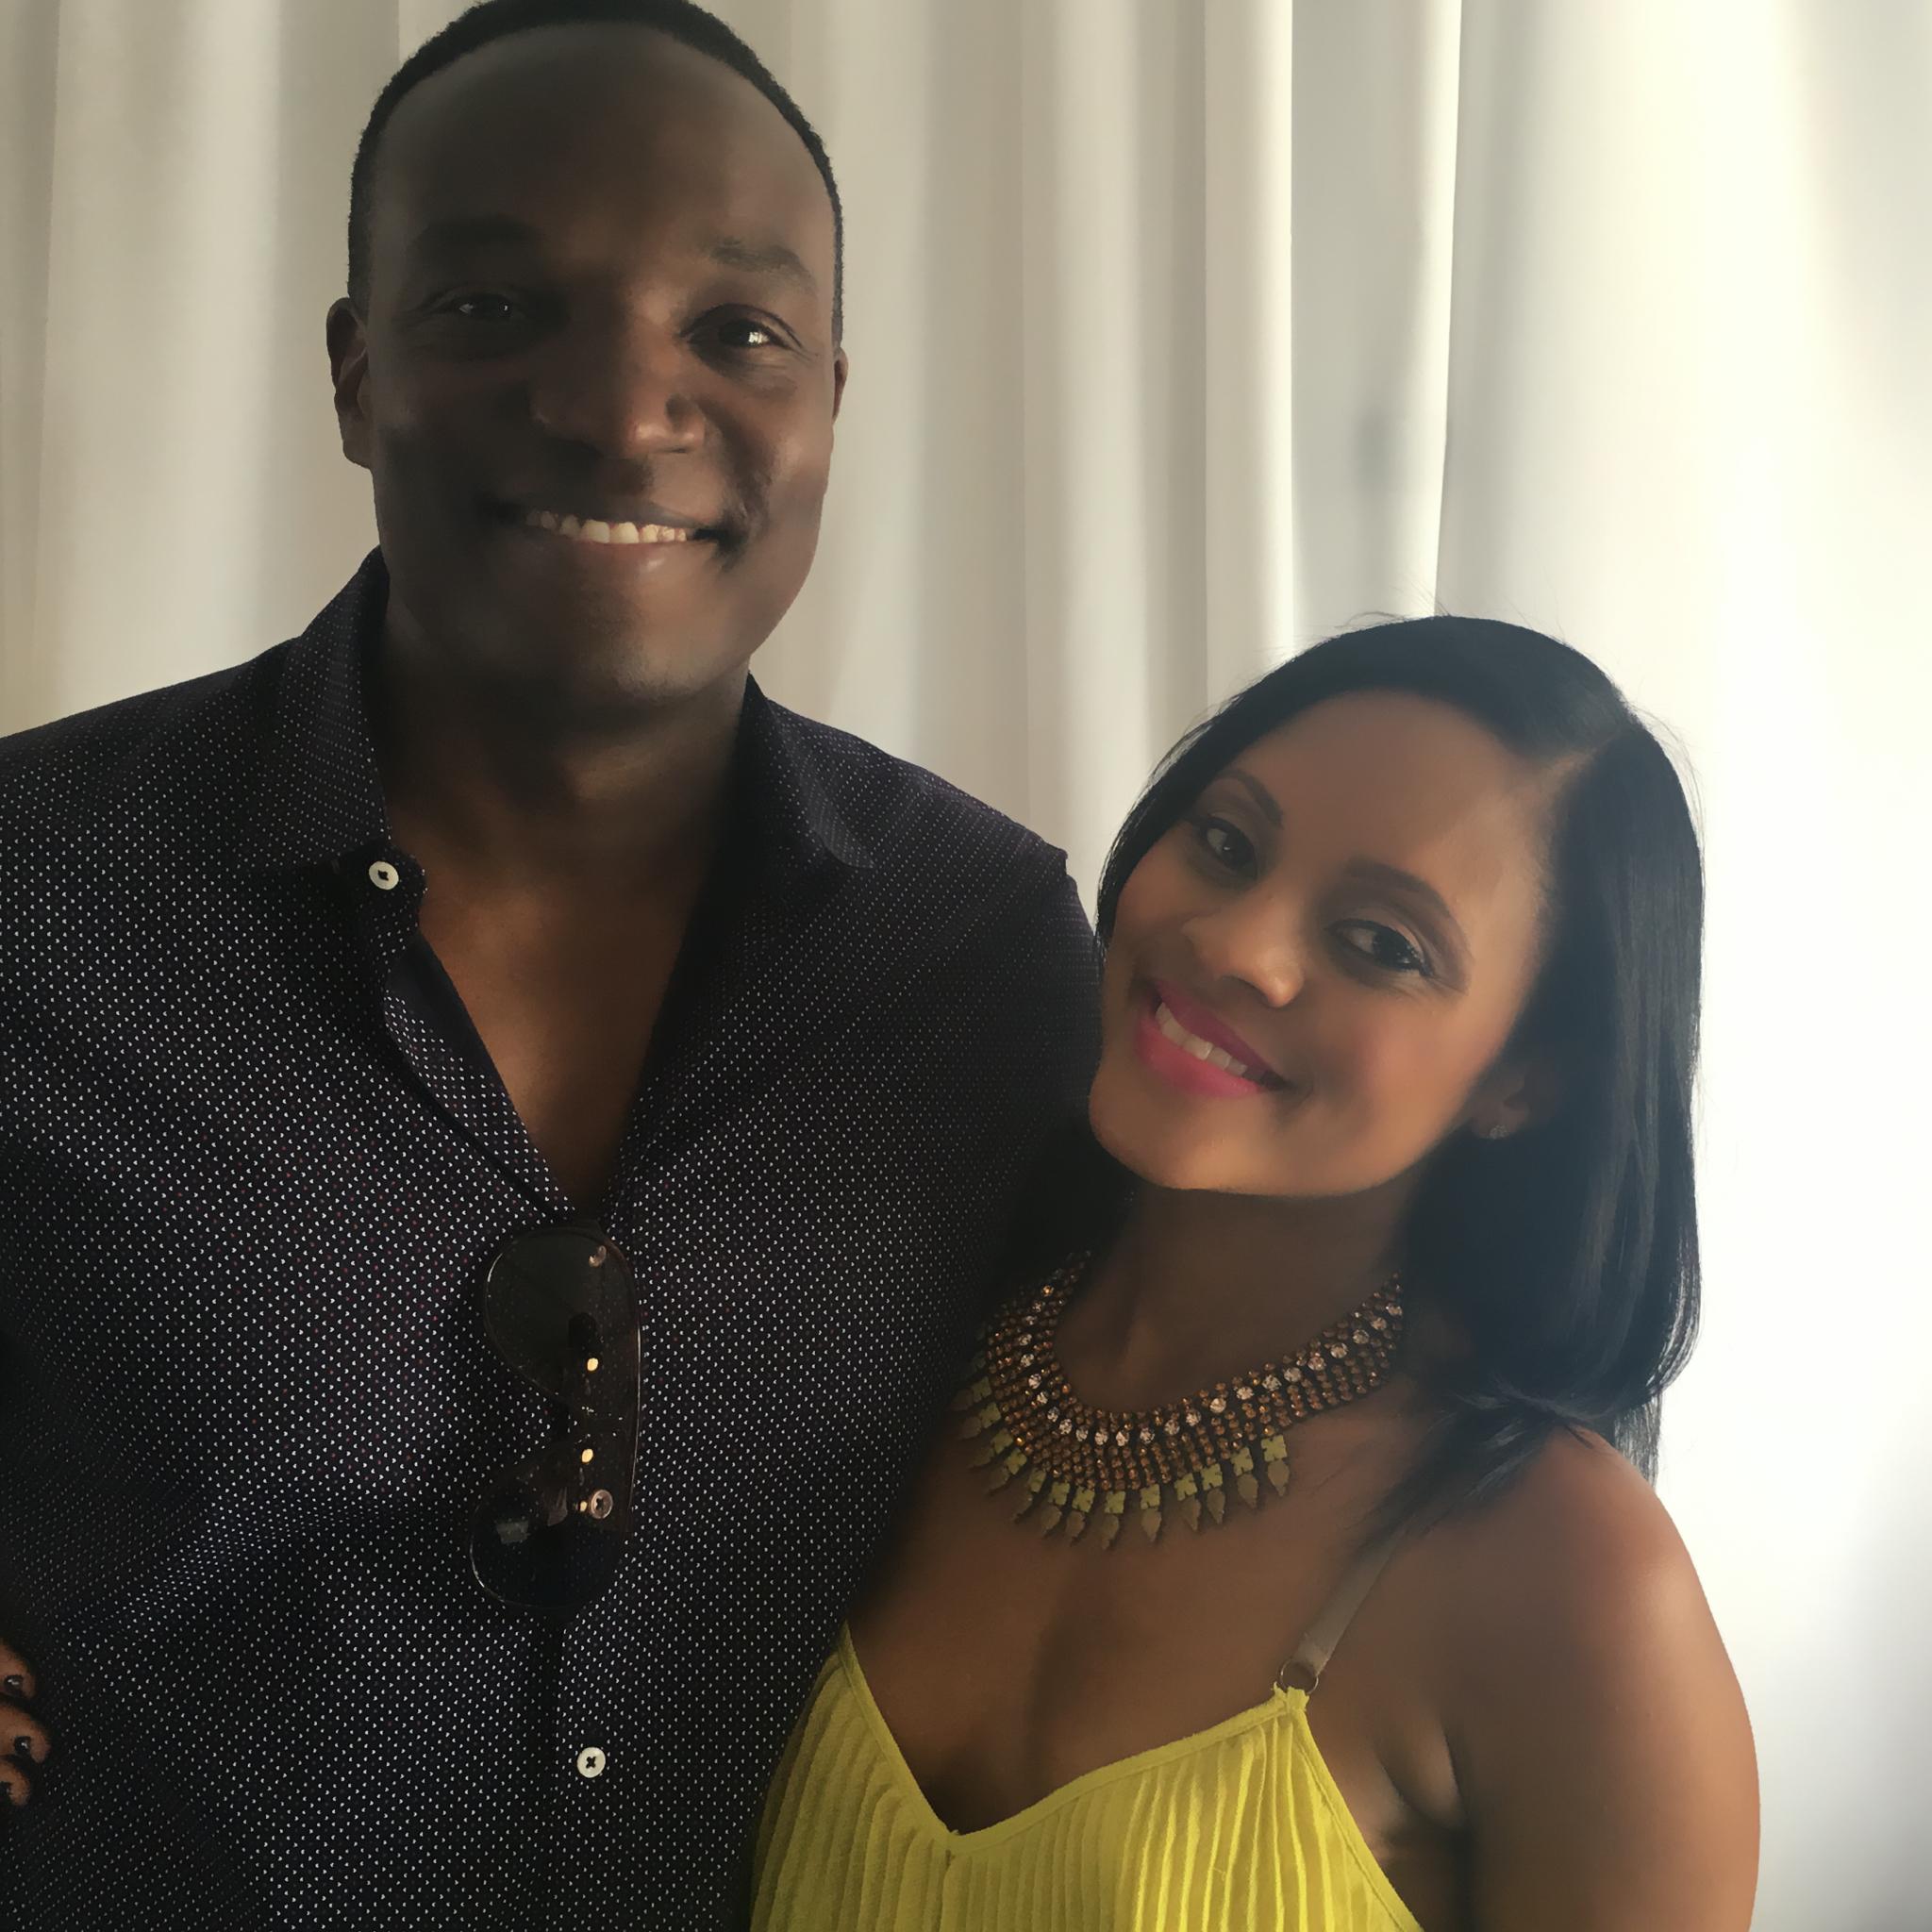 Host Maria Wills and Kwame Jackson